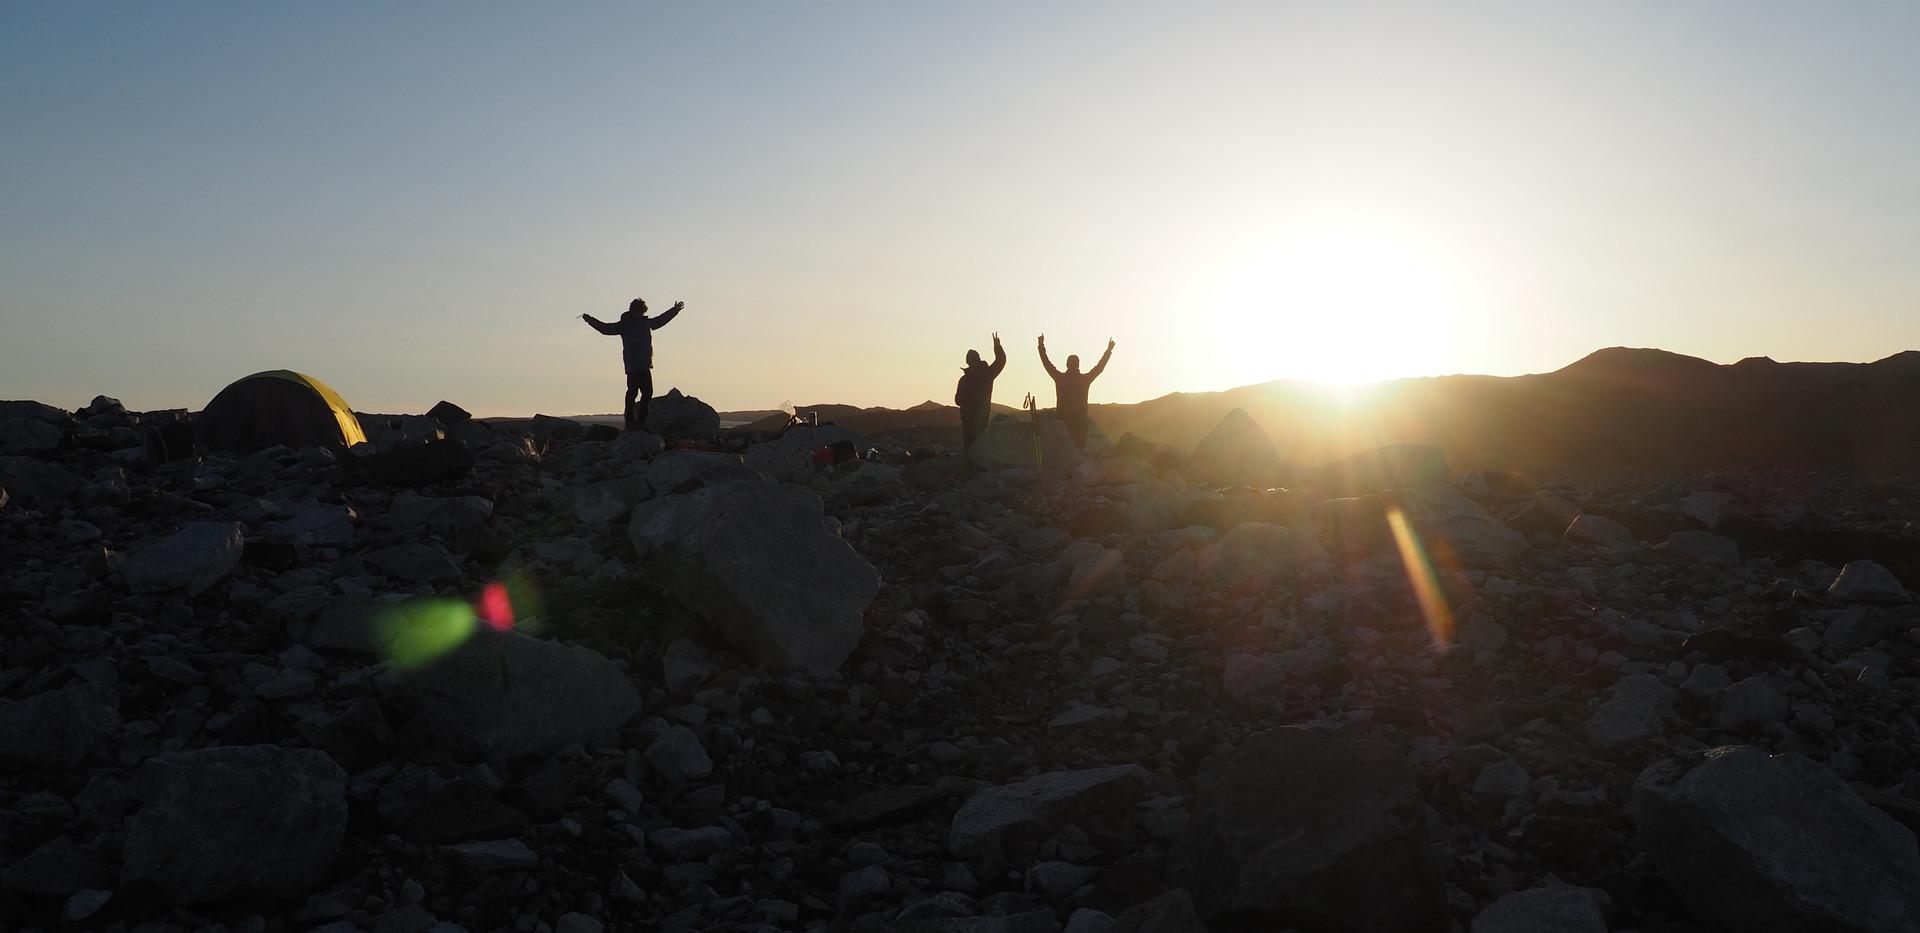 Camp 3 at sunset